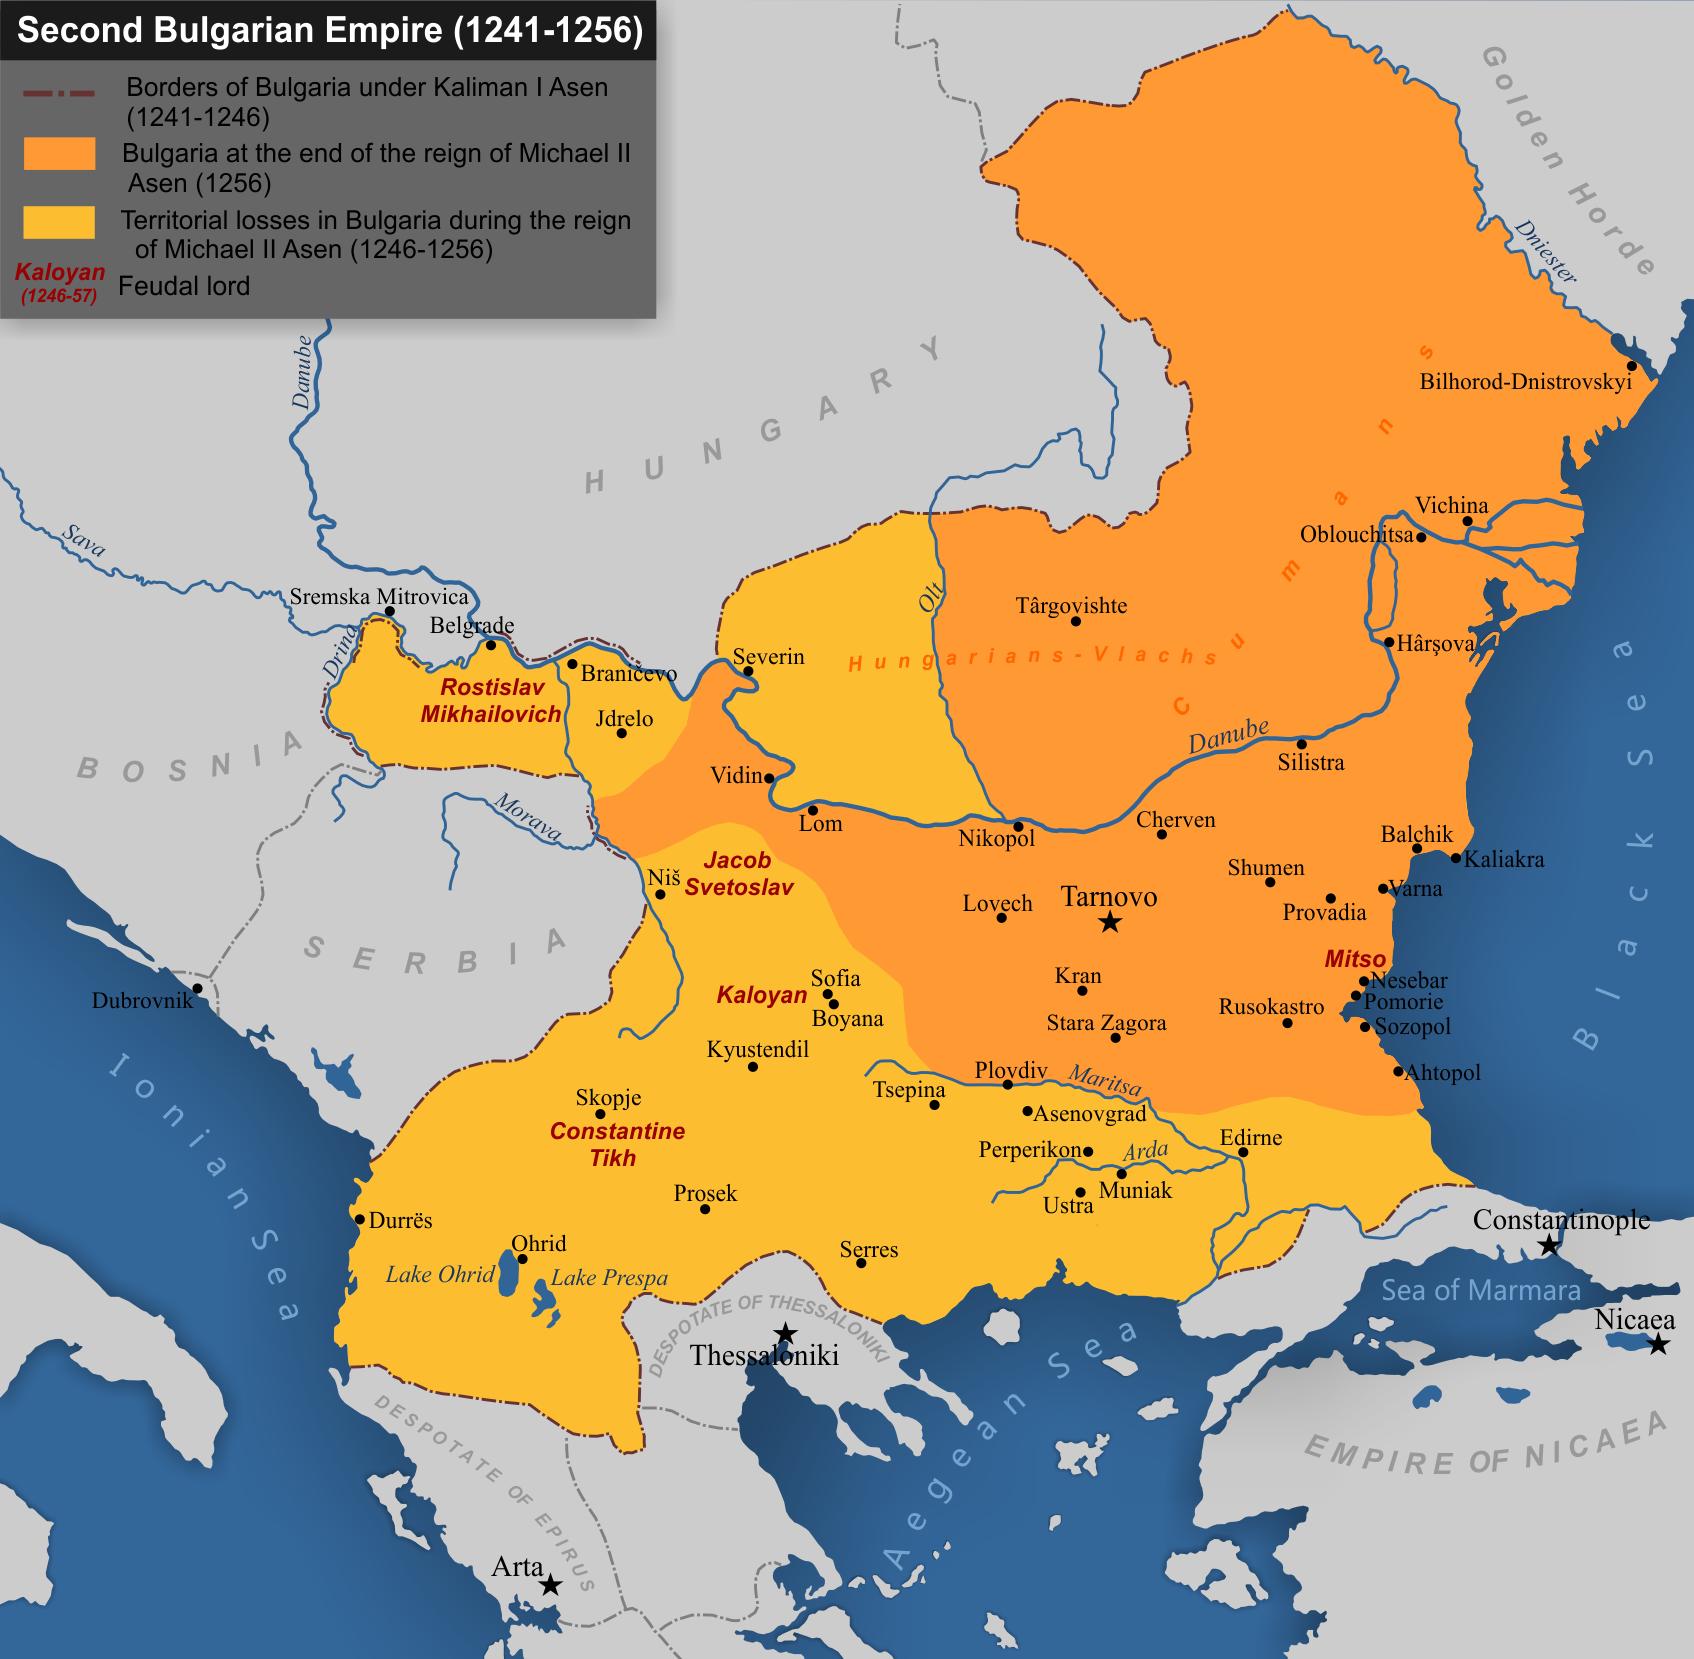 Ukrajinske snage granatirale su Donjeck - Page 15 Second_Bulgarian_Empire_%281241-1256%29